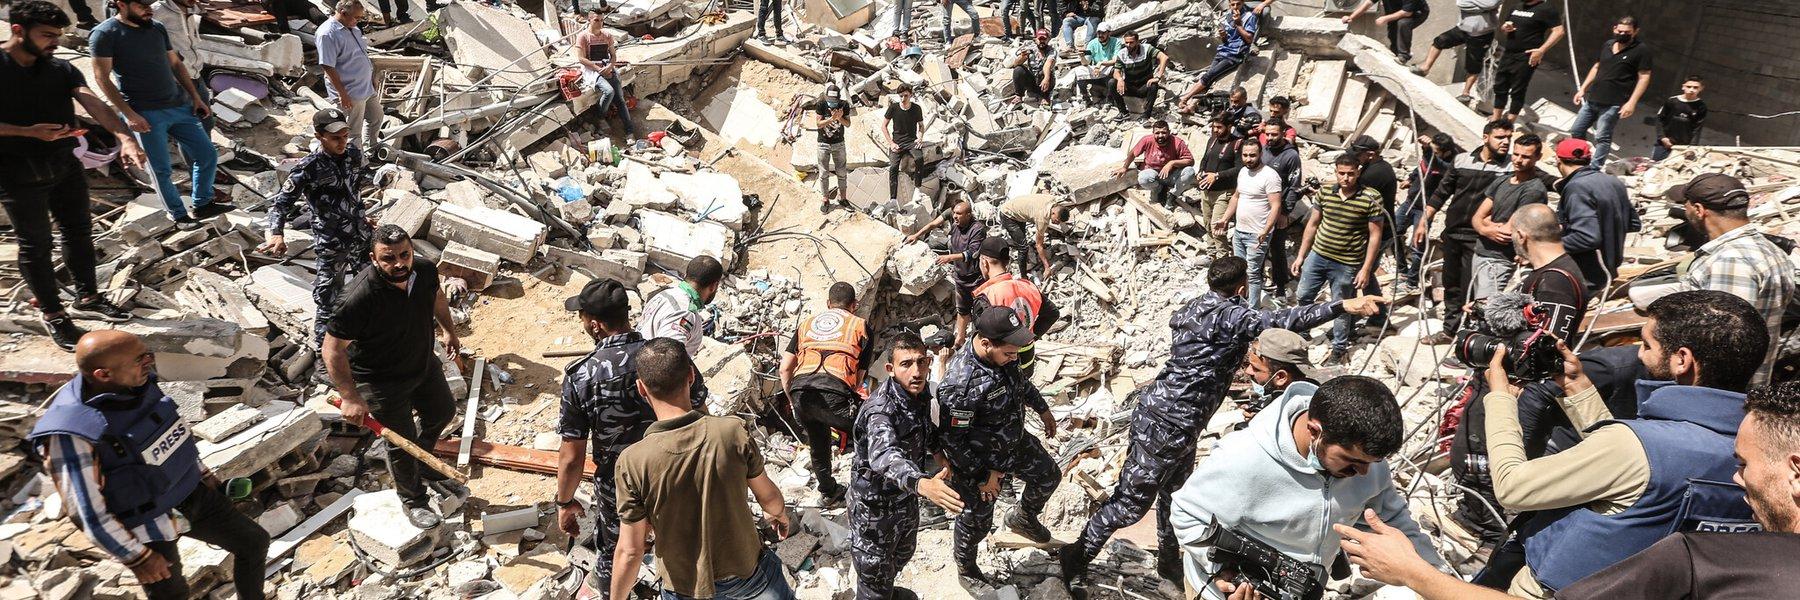 Devastation in Gaza. Photo: Fady Hanona